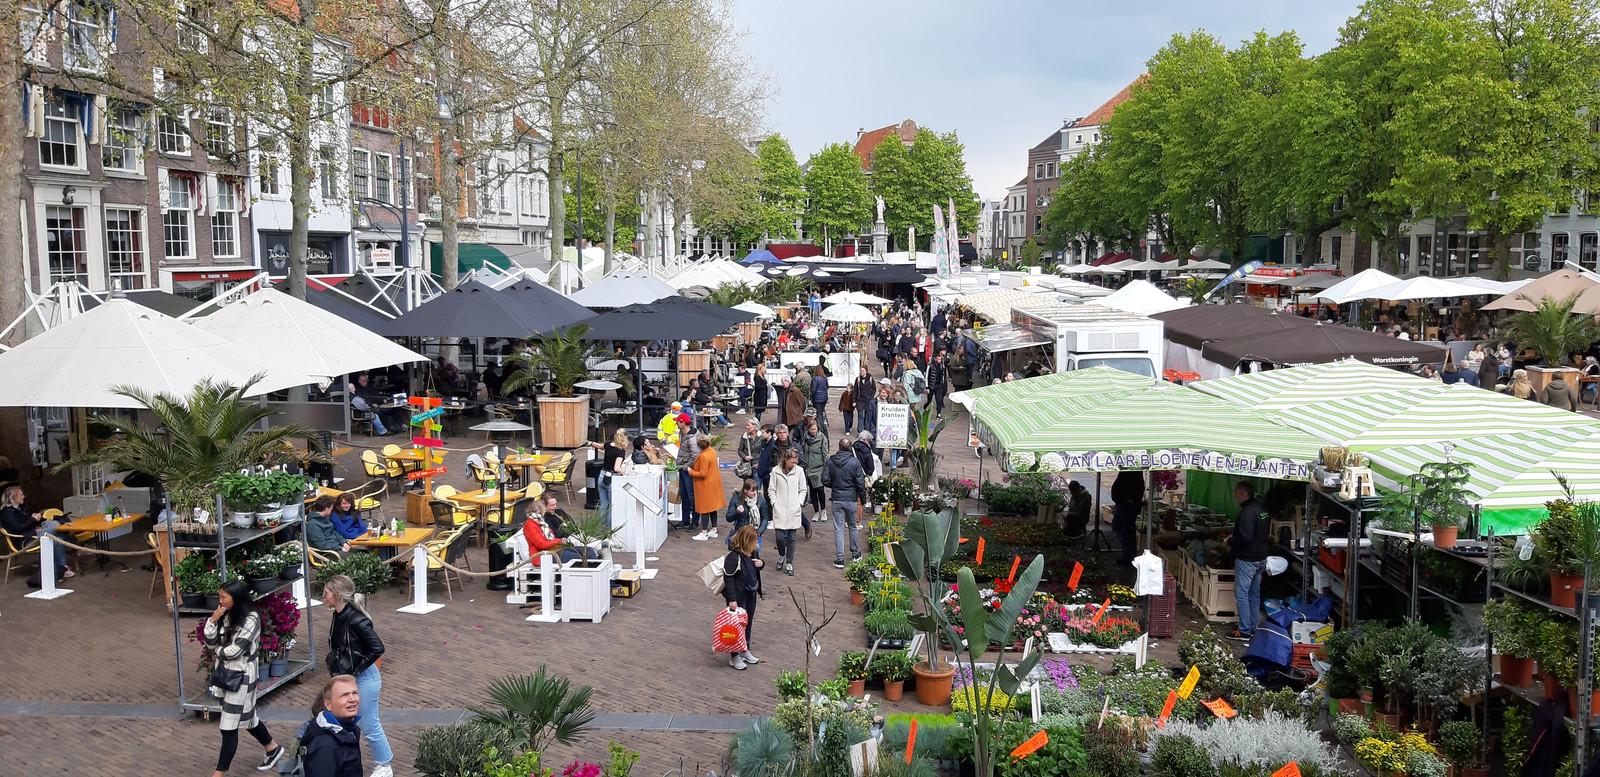 De drukte in de Deventer binnenstad in beeld.